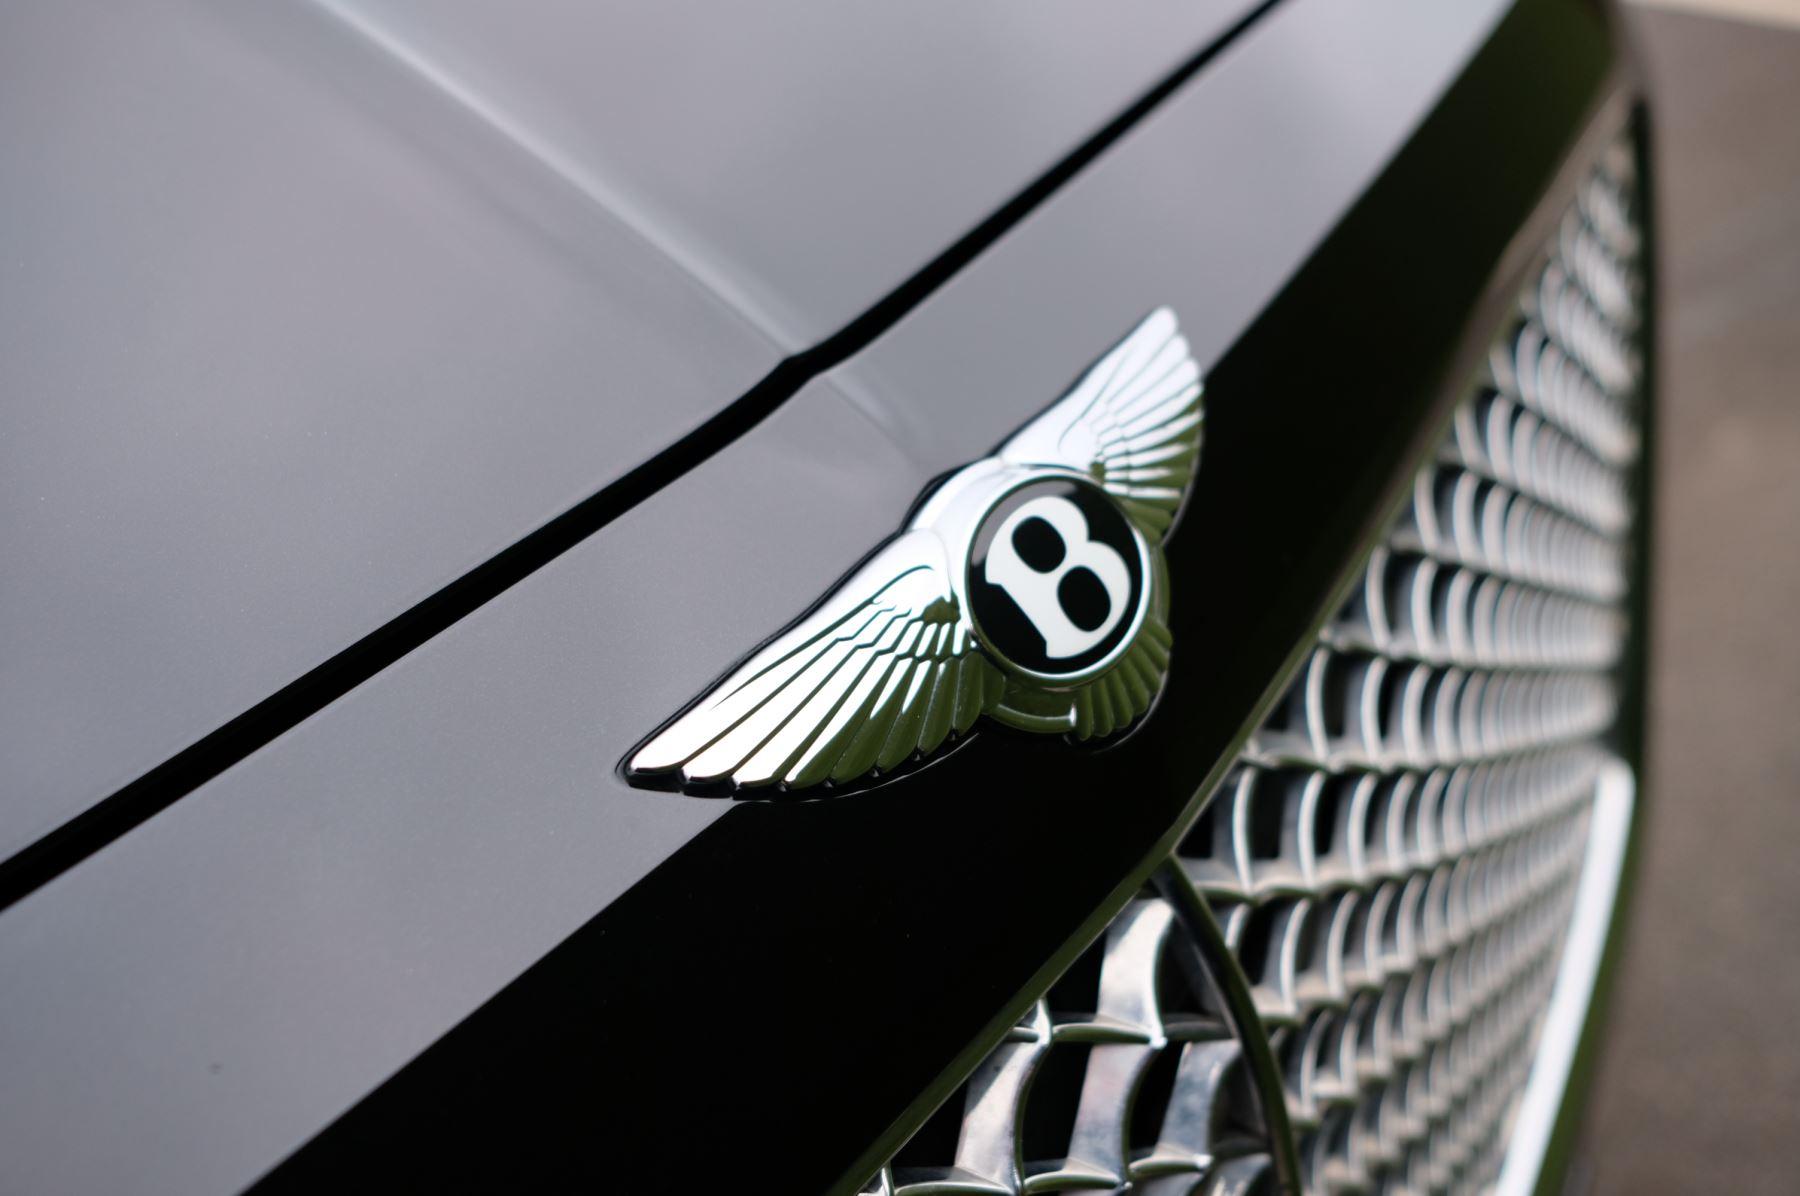 Bentley Bentayga Diesel 4.0 V8 Mulliner Driving Spec 5dr Auto - 7 Seat Specification image 10